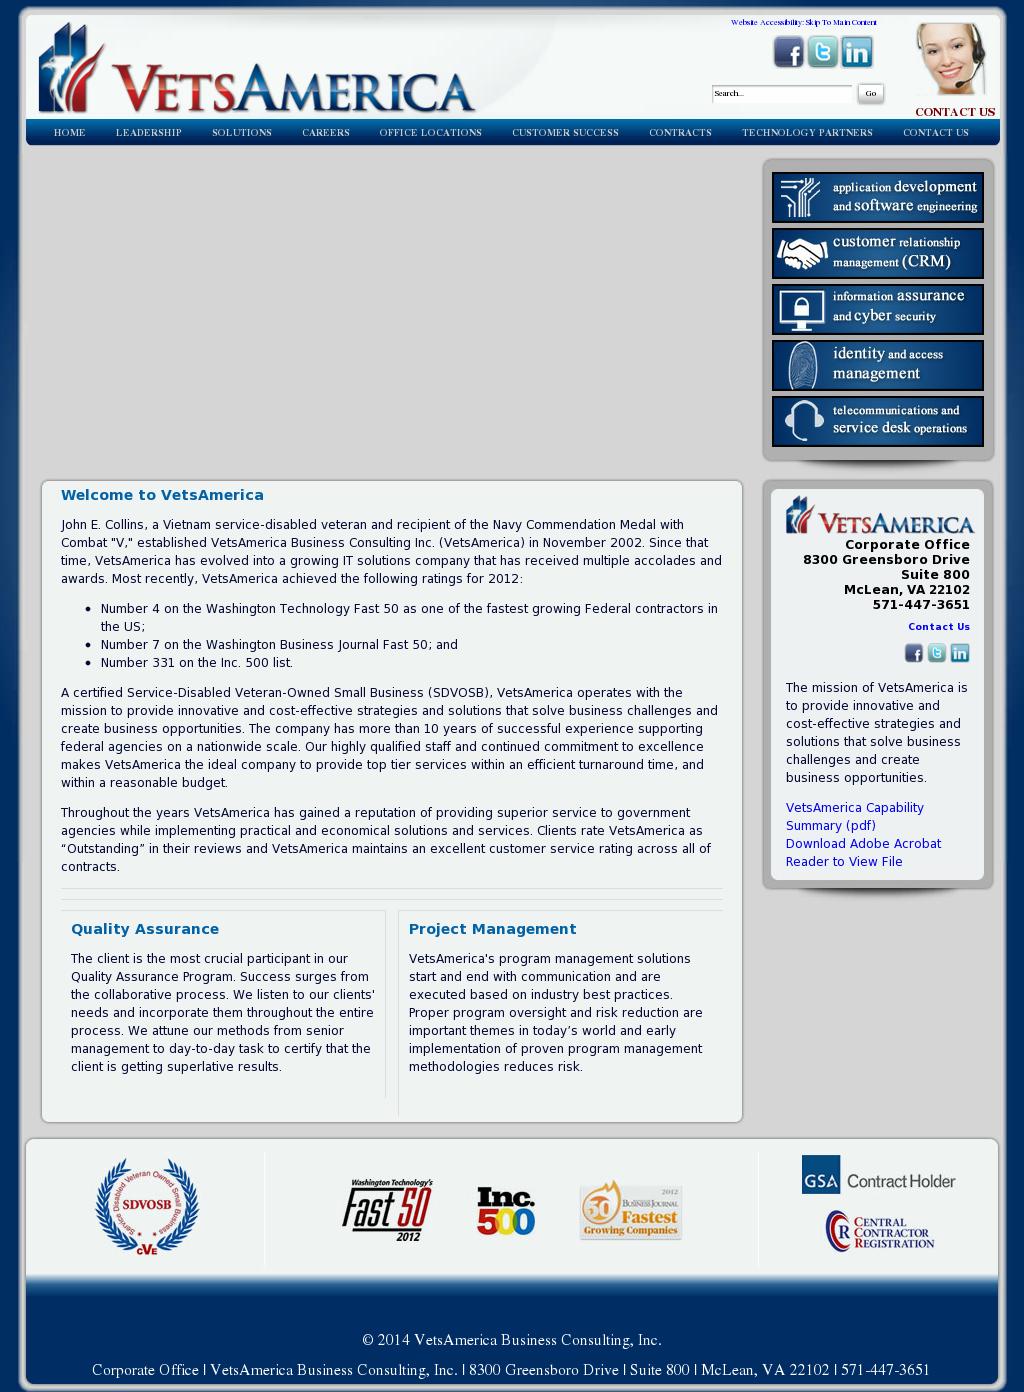 VetsAmerica Competitors, Revenue and Employees - Owler